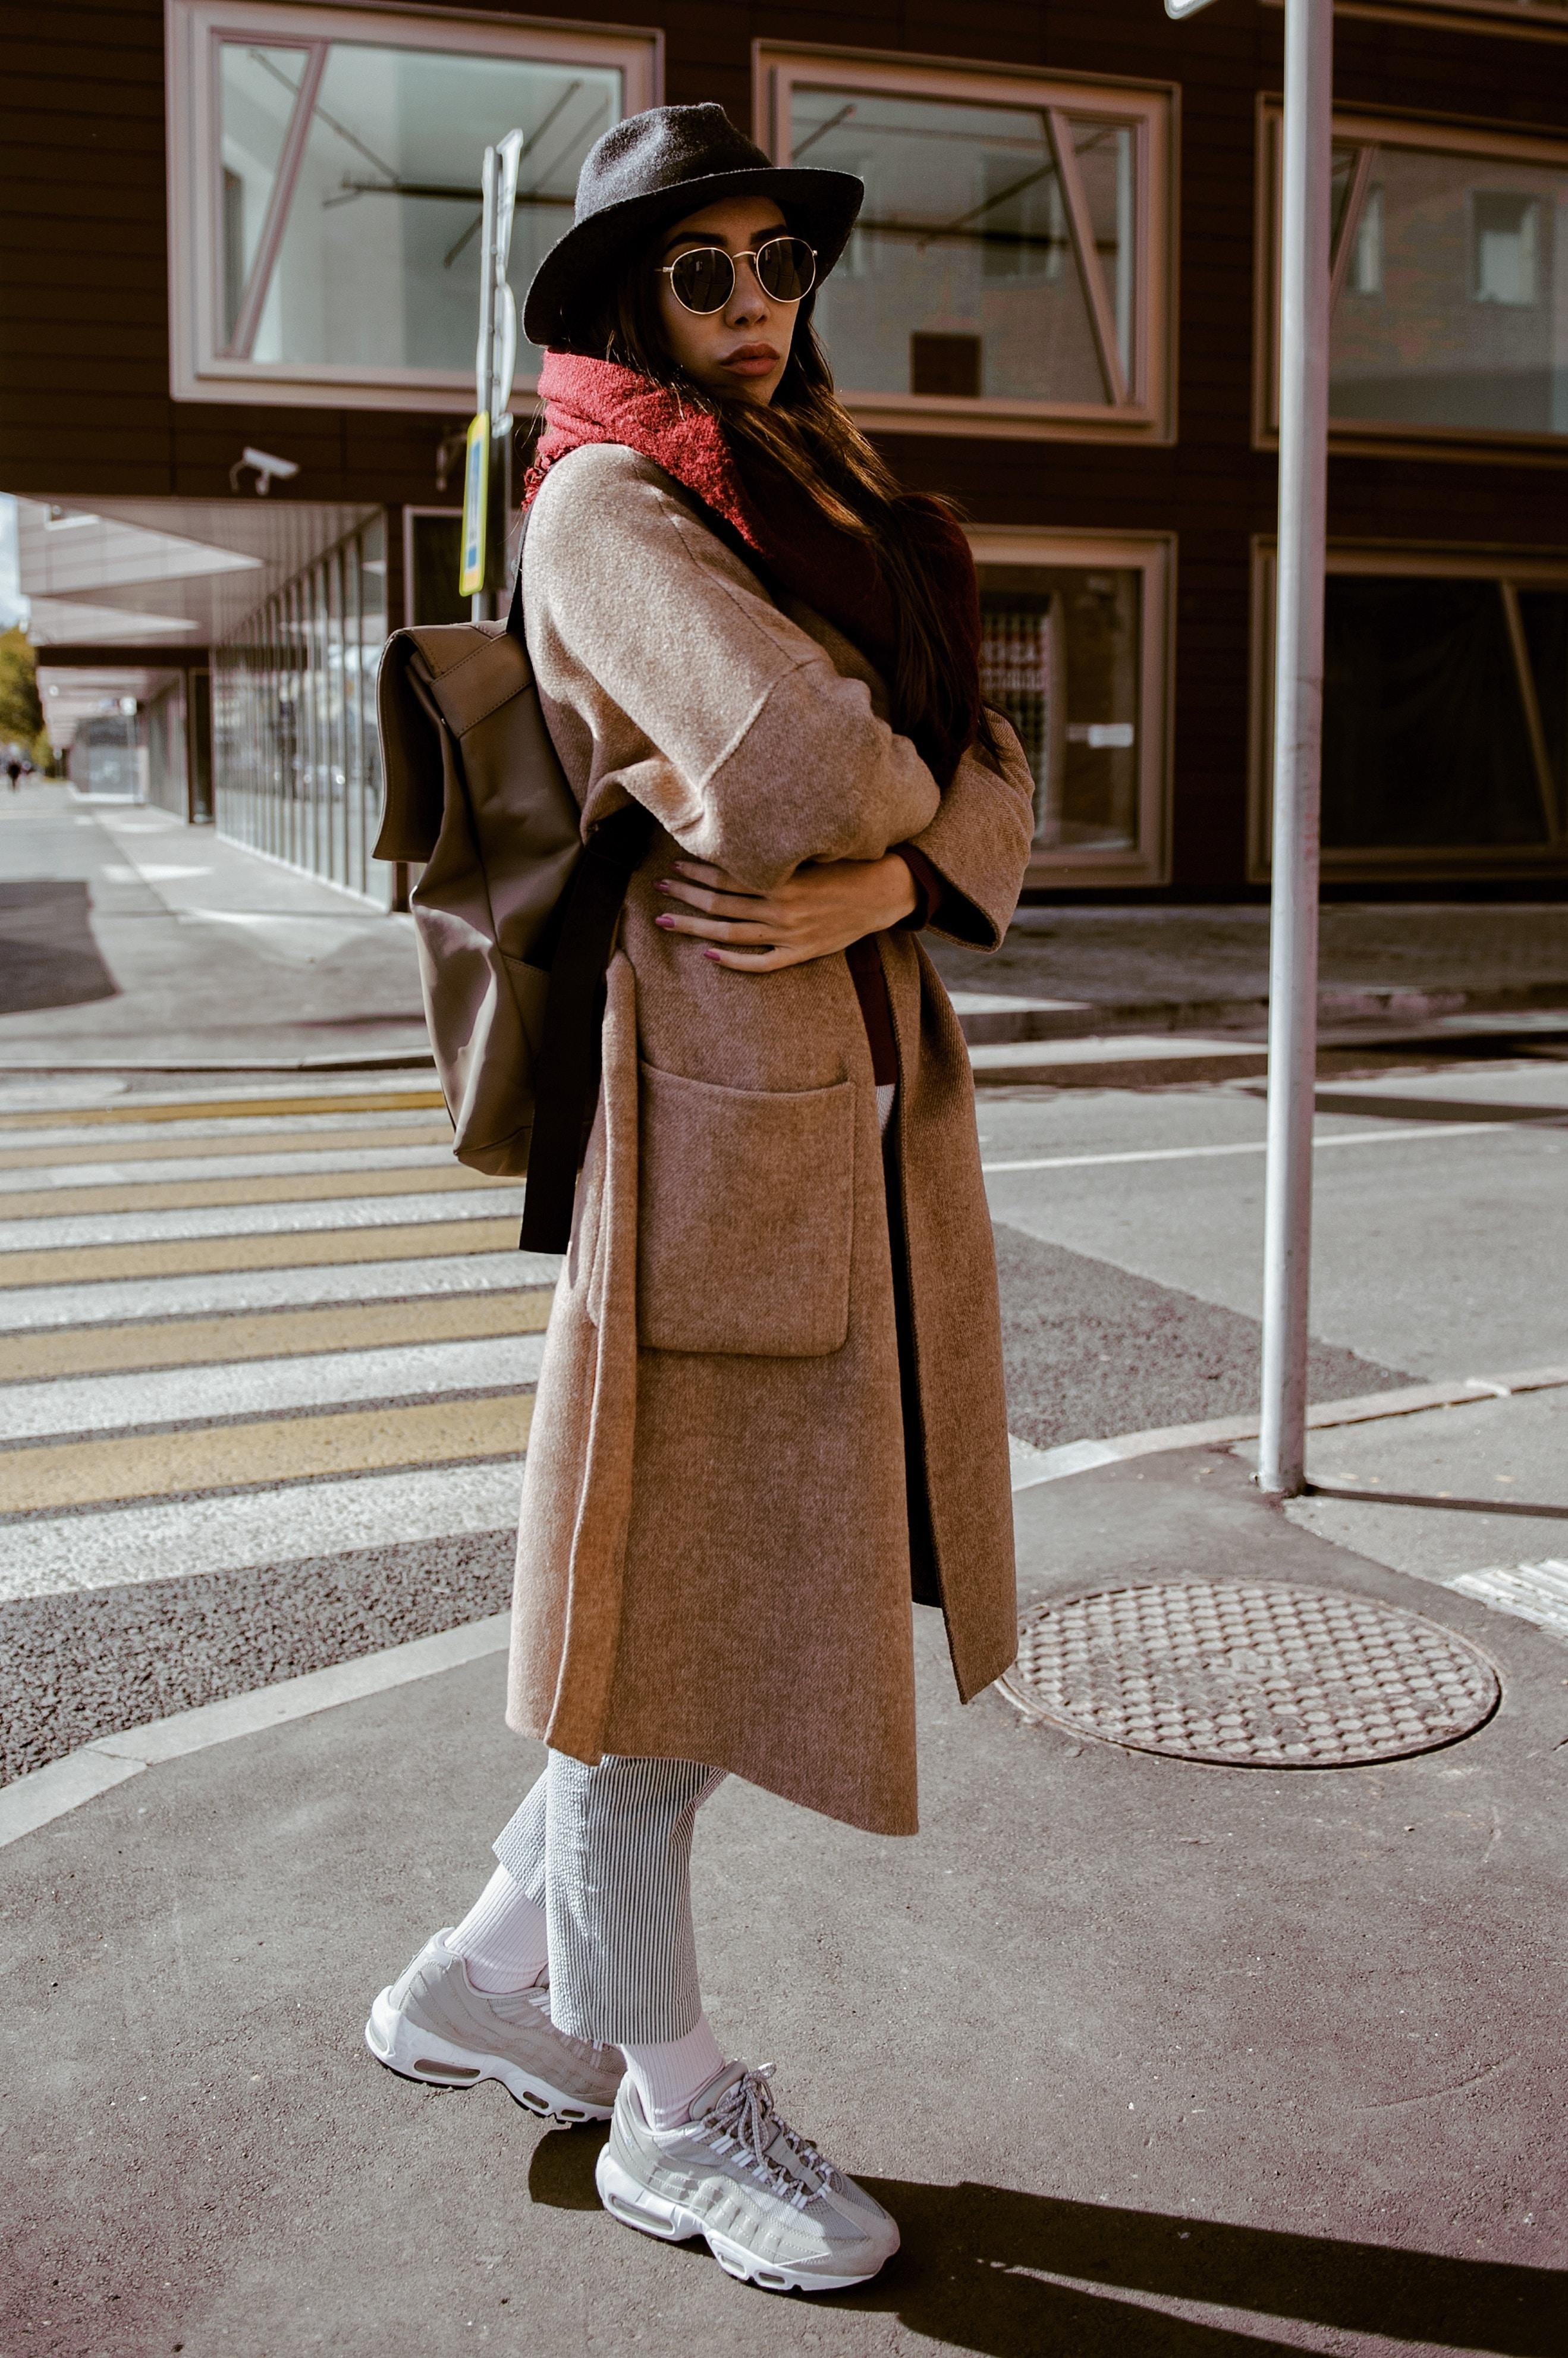 woman in brown coat near pedestrian during daytime